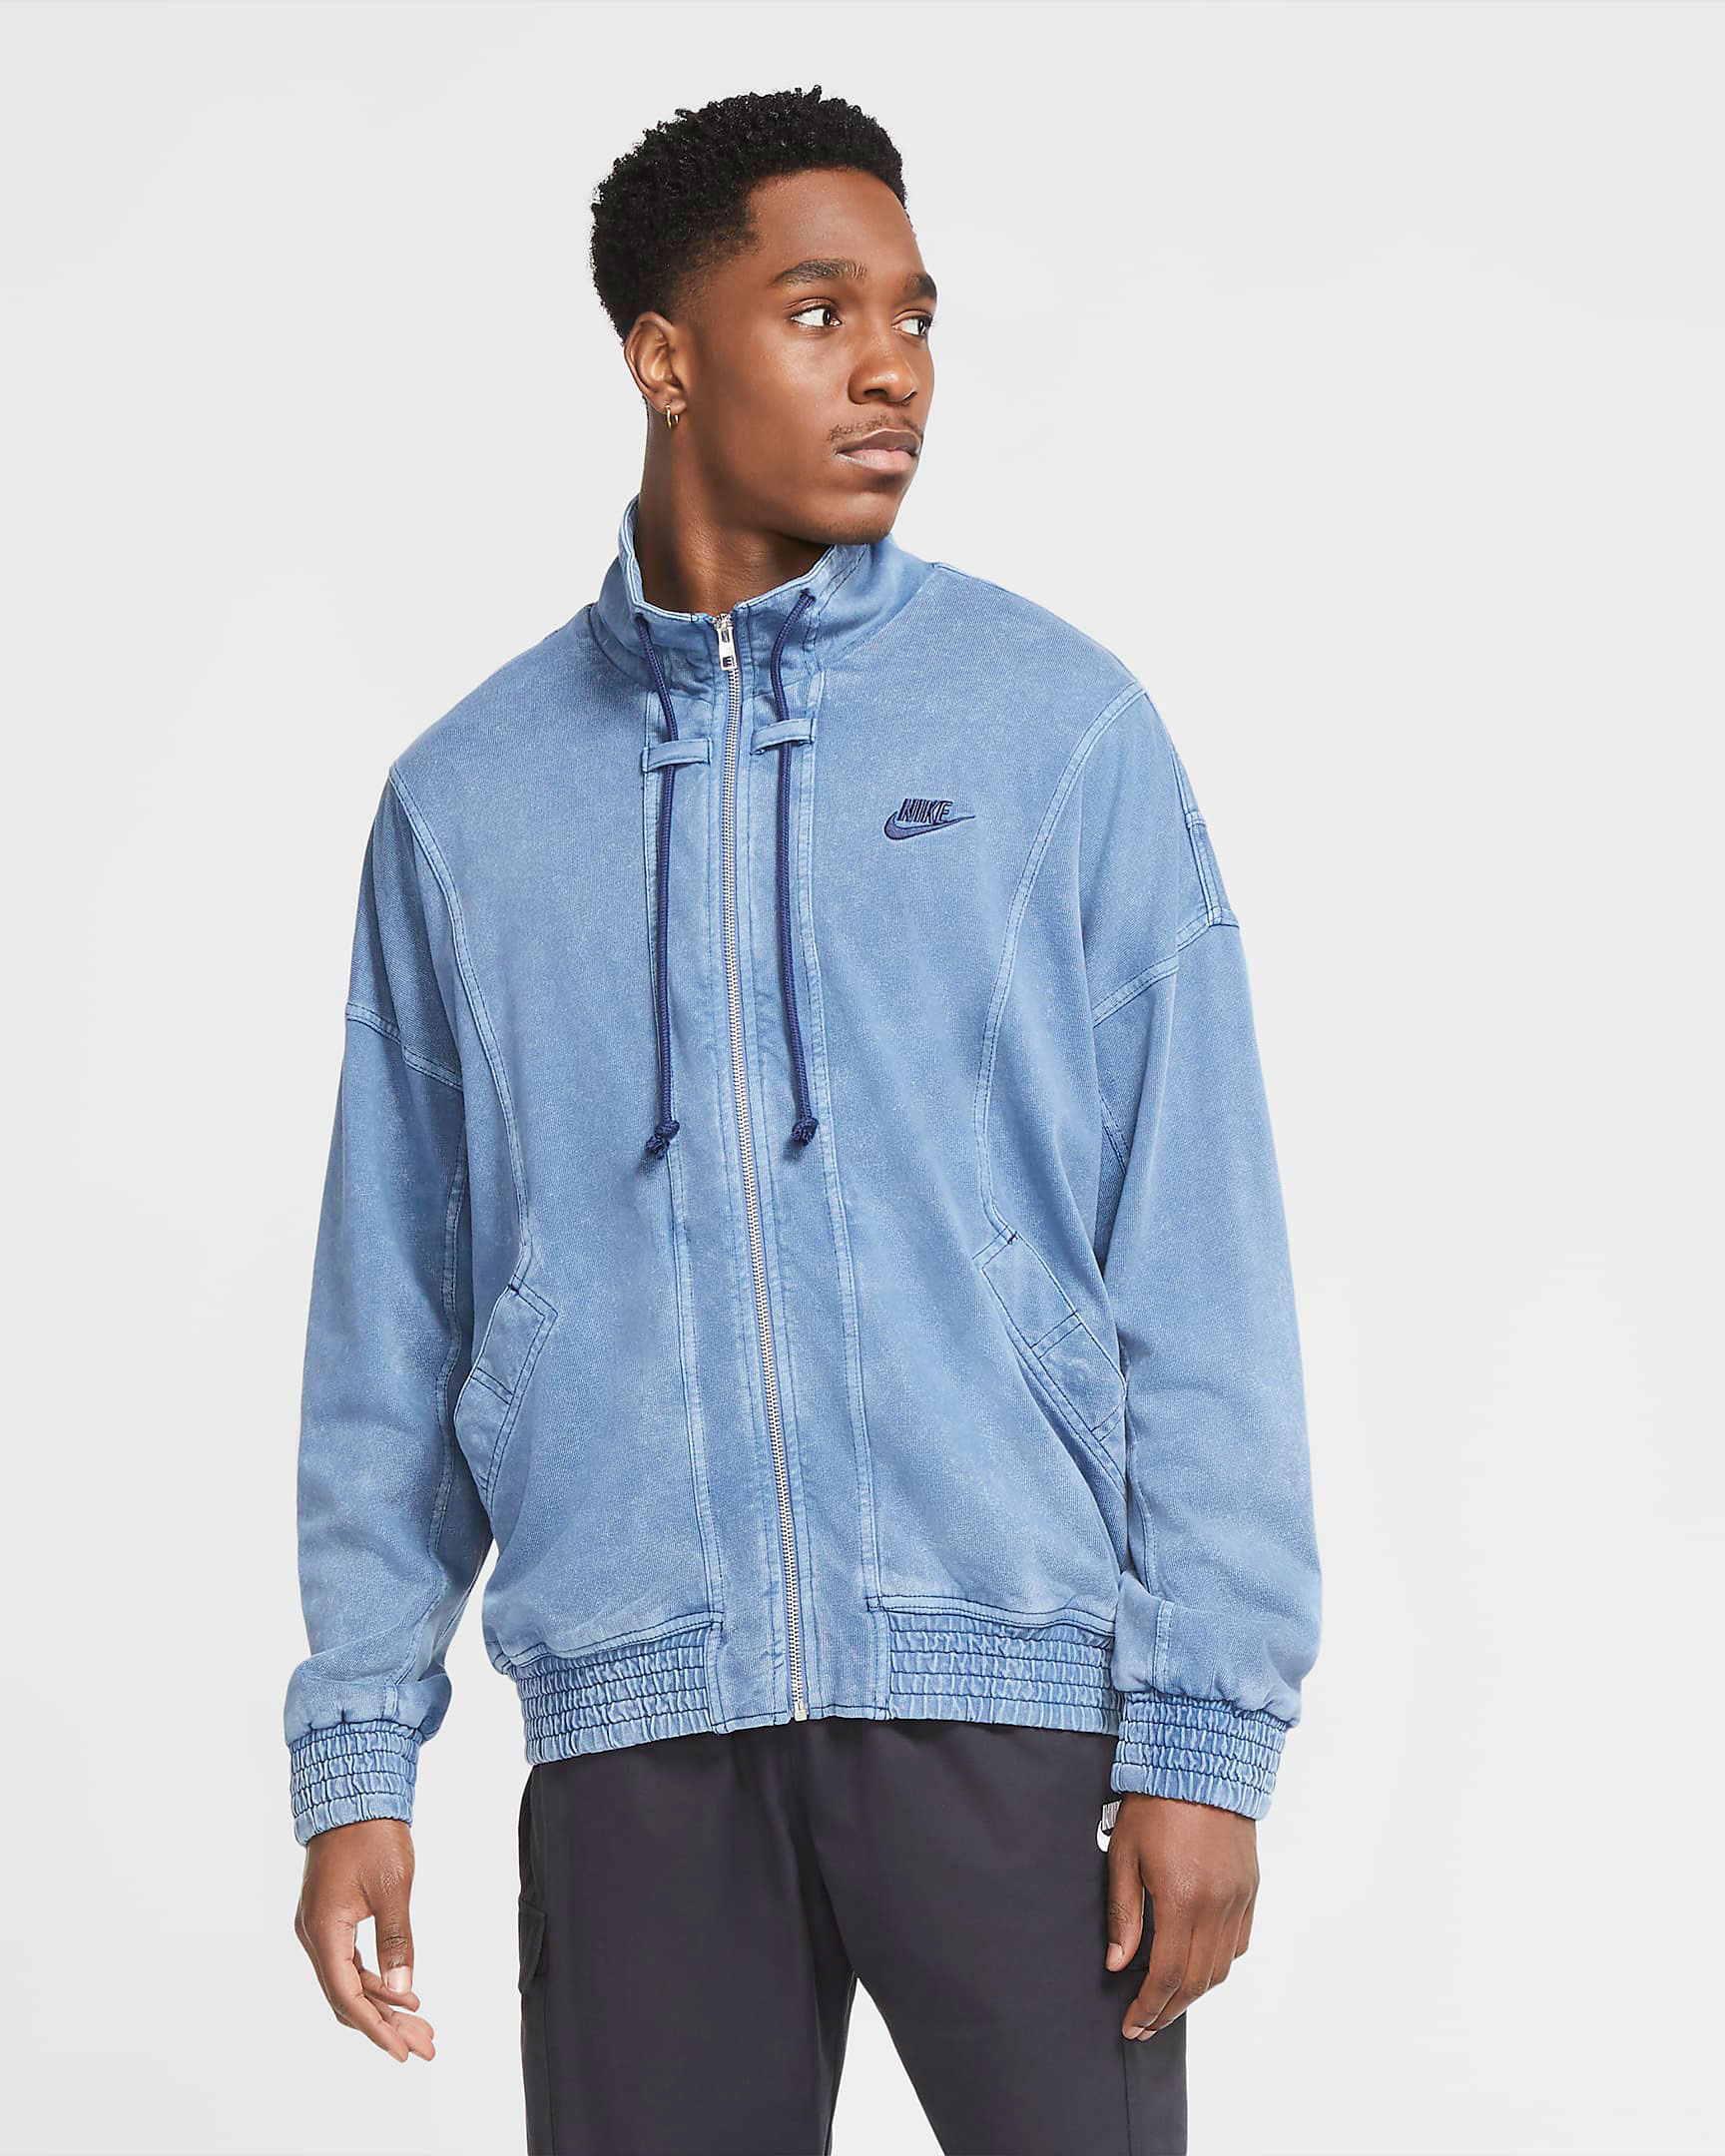 nike-kobe-ad-nxt-blue-hero-nike-sportswear-jacket-match